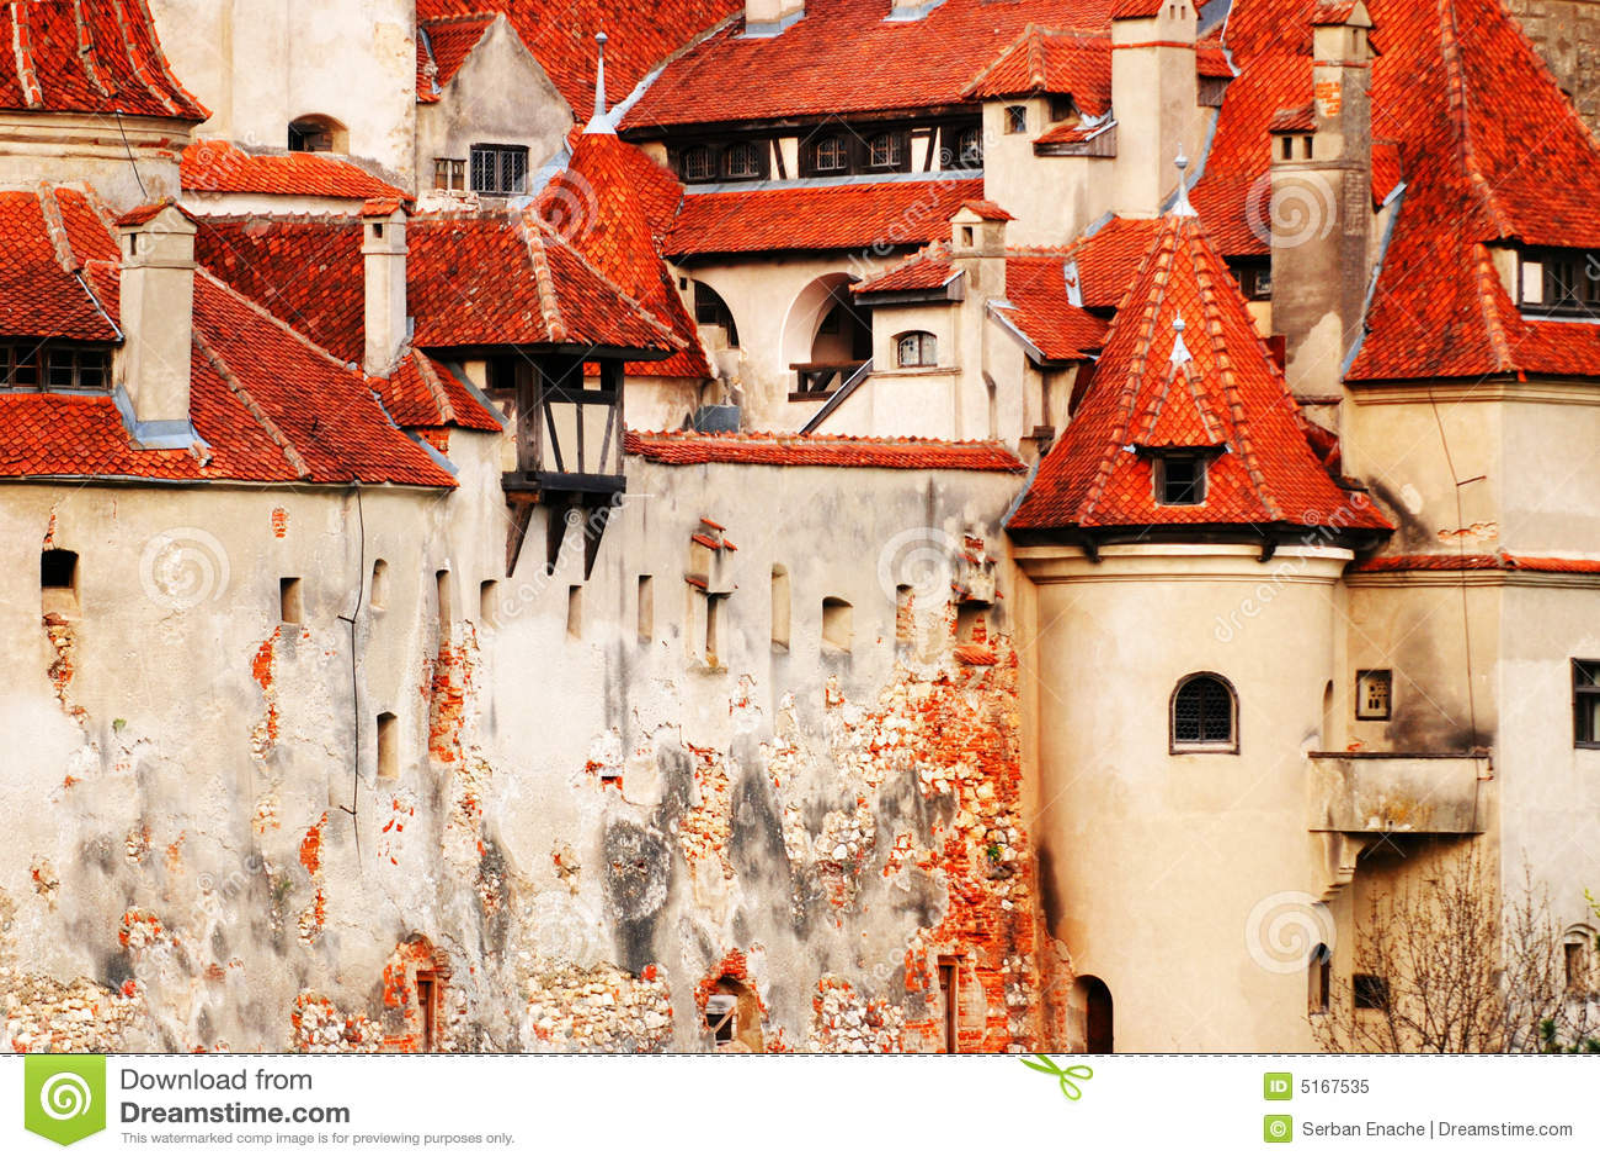 Details of the Bran Castle